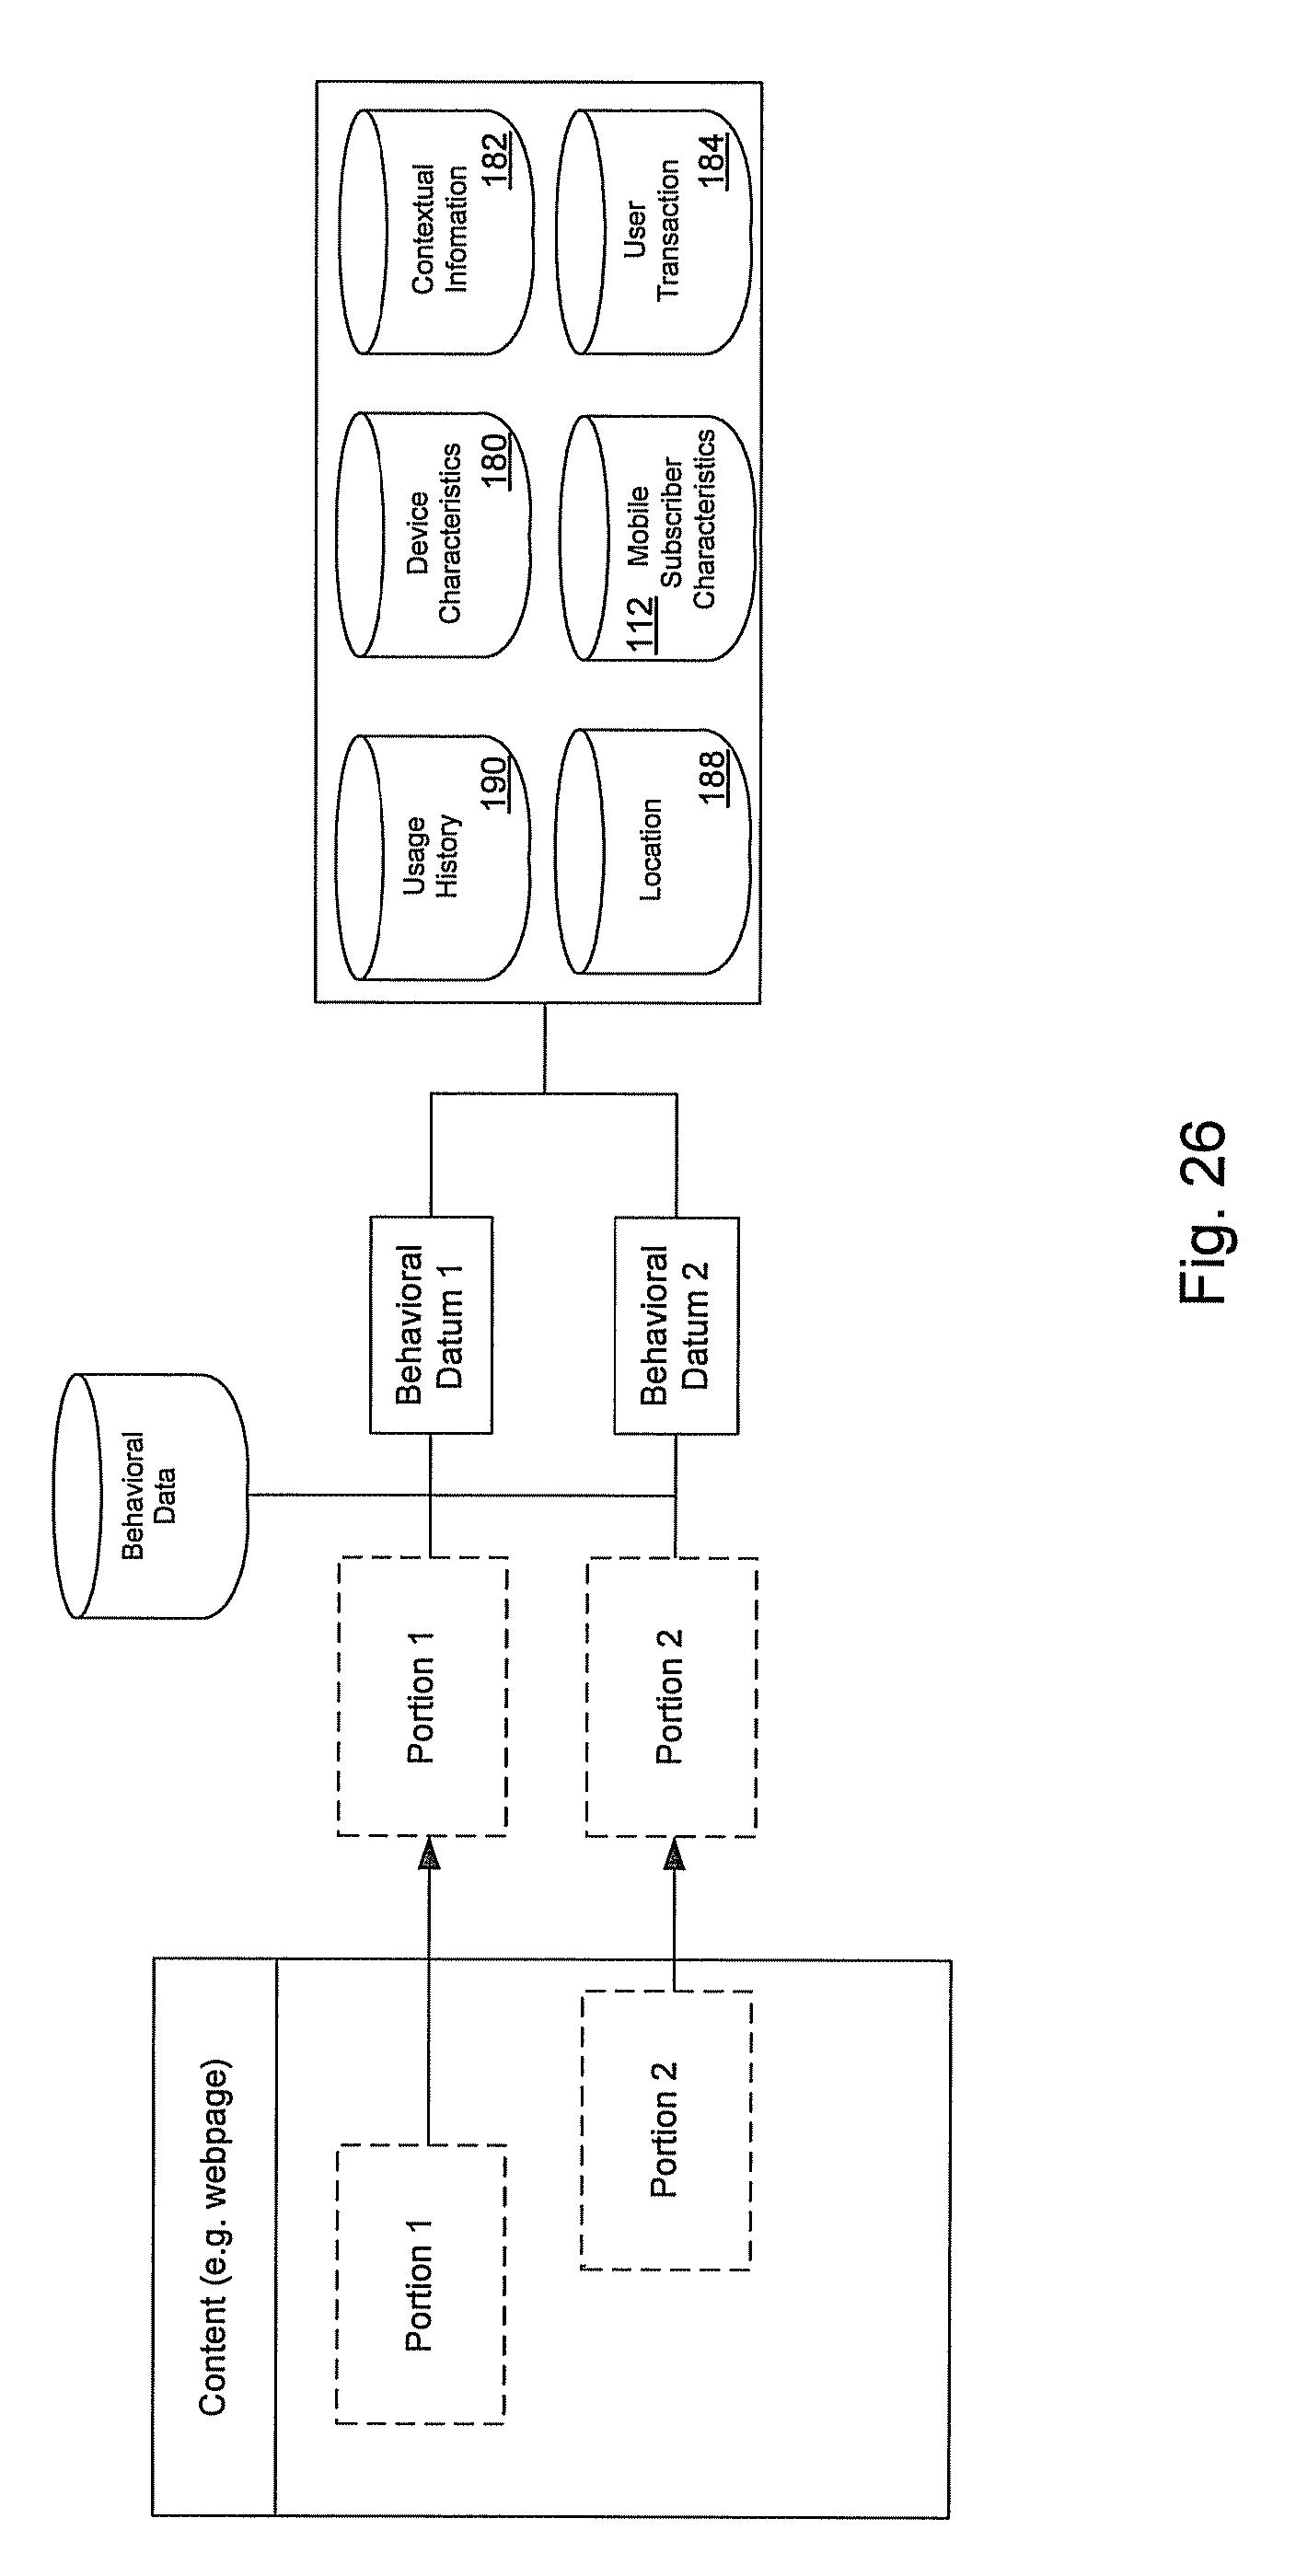 Patent US 9,058,406 B2